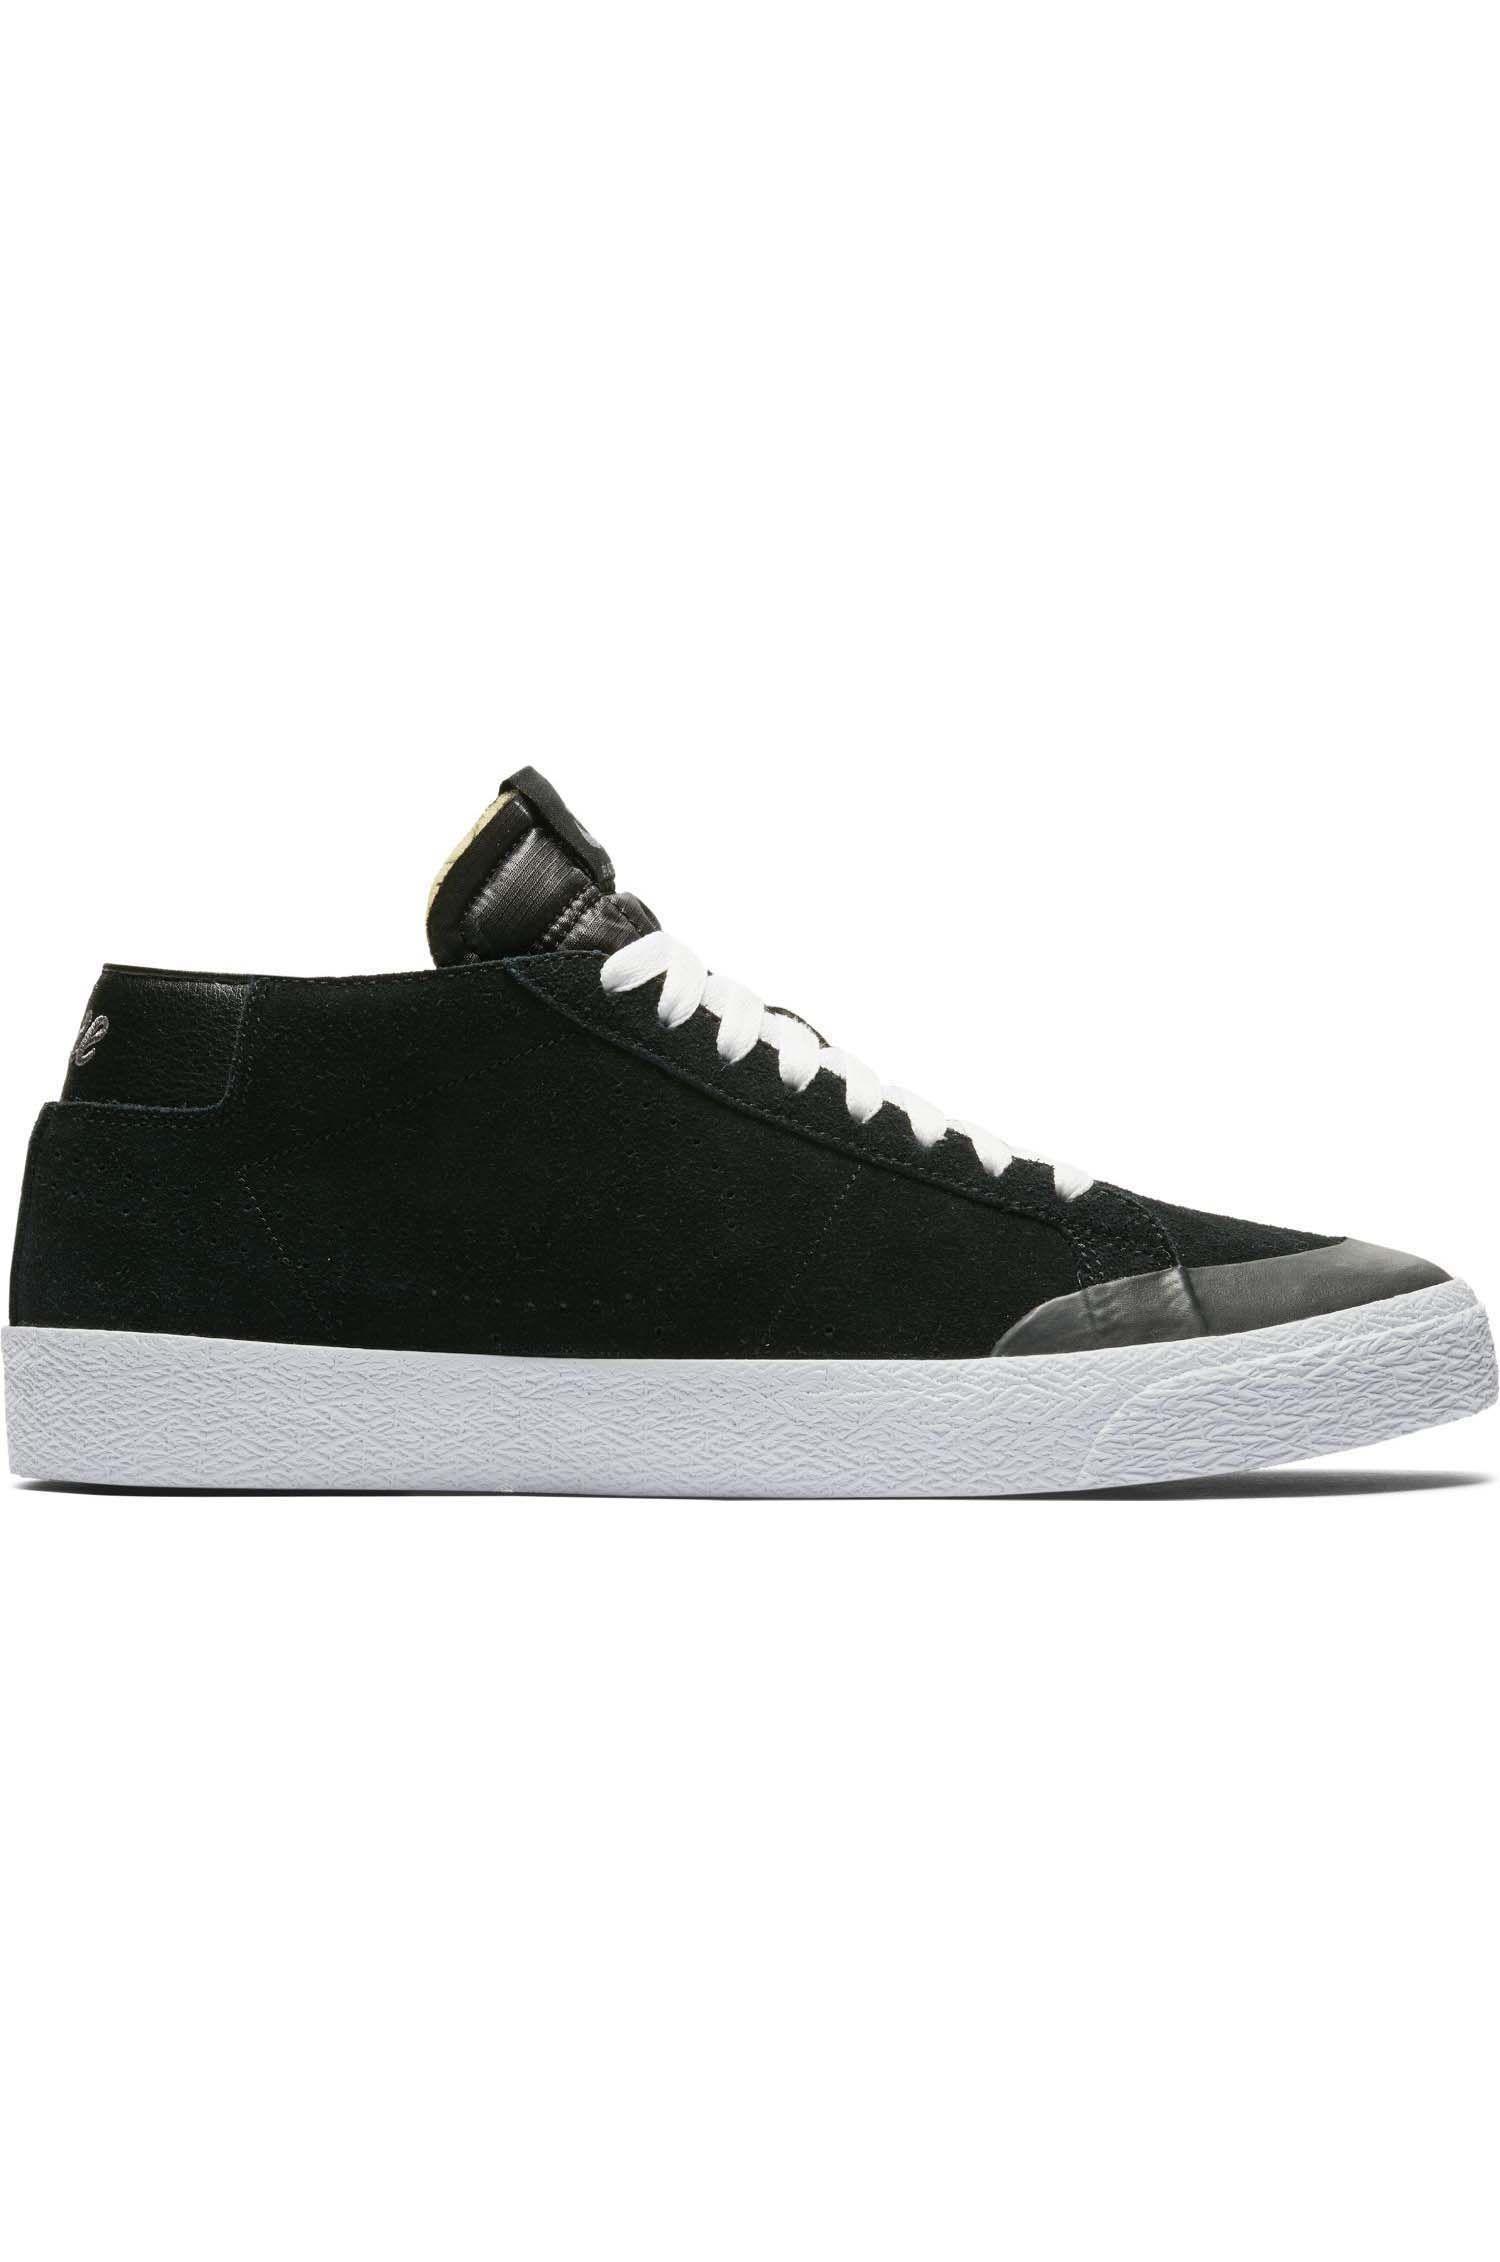 Tenis Nike Sb ZOOM BLAZER U CHUKKA XT Black/Black-Gunsmoke